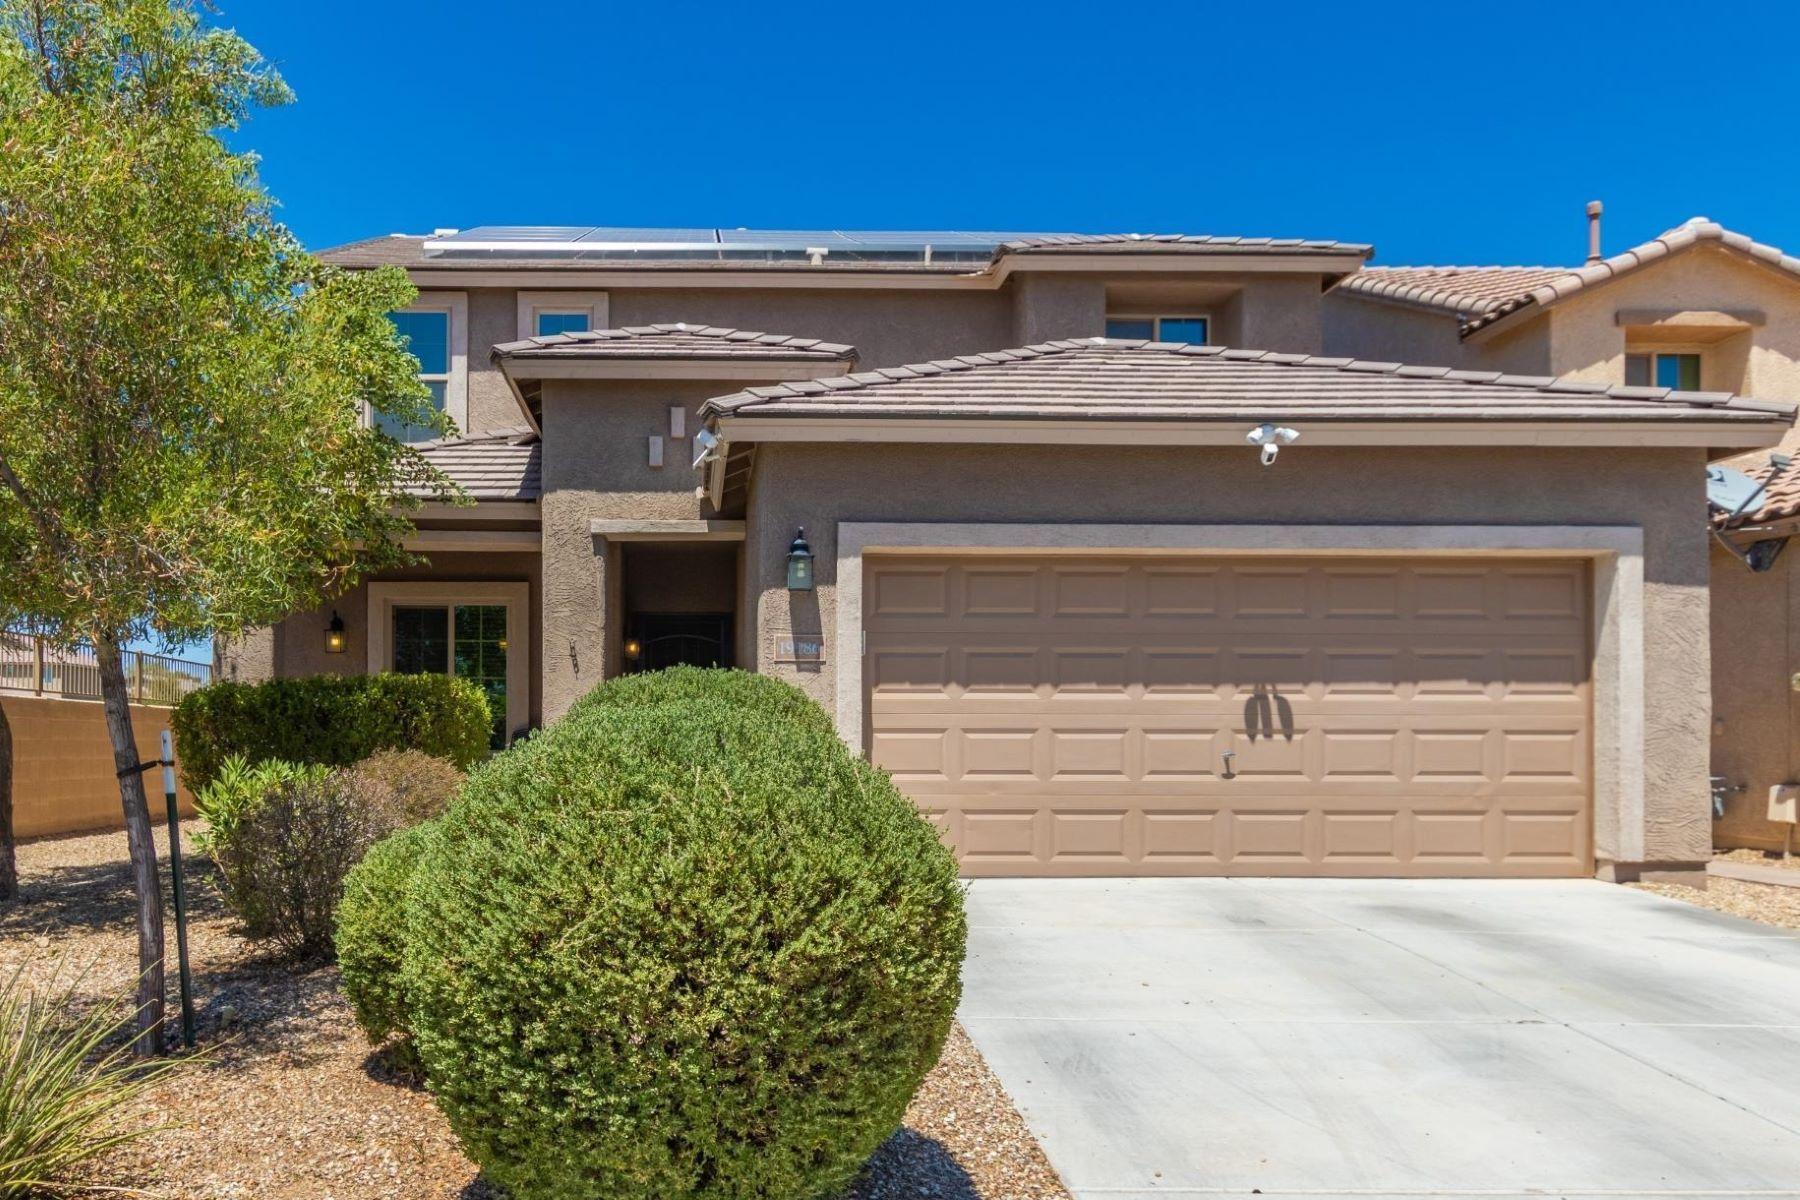 Single Family Homes por un Venta en Vista De Montana 19186 W ADAMS ST Buckeye, Arizona 85326 Estados Unidos